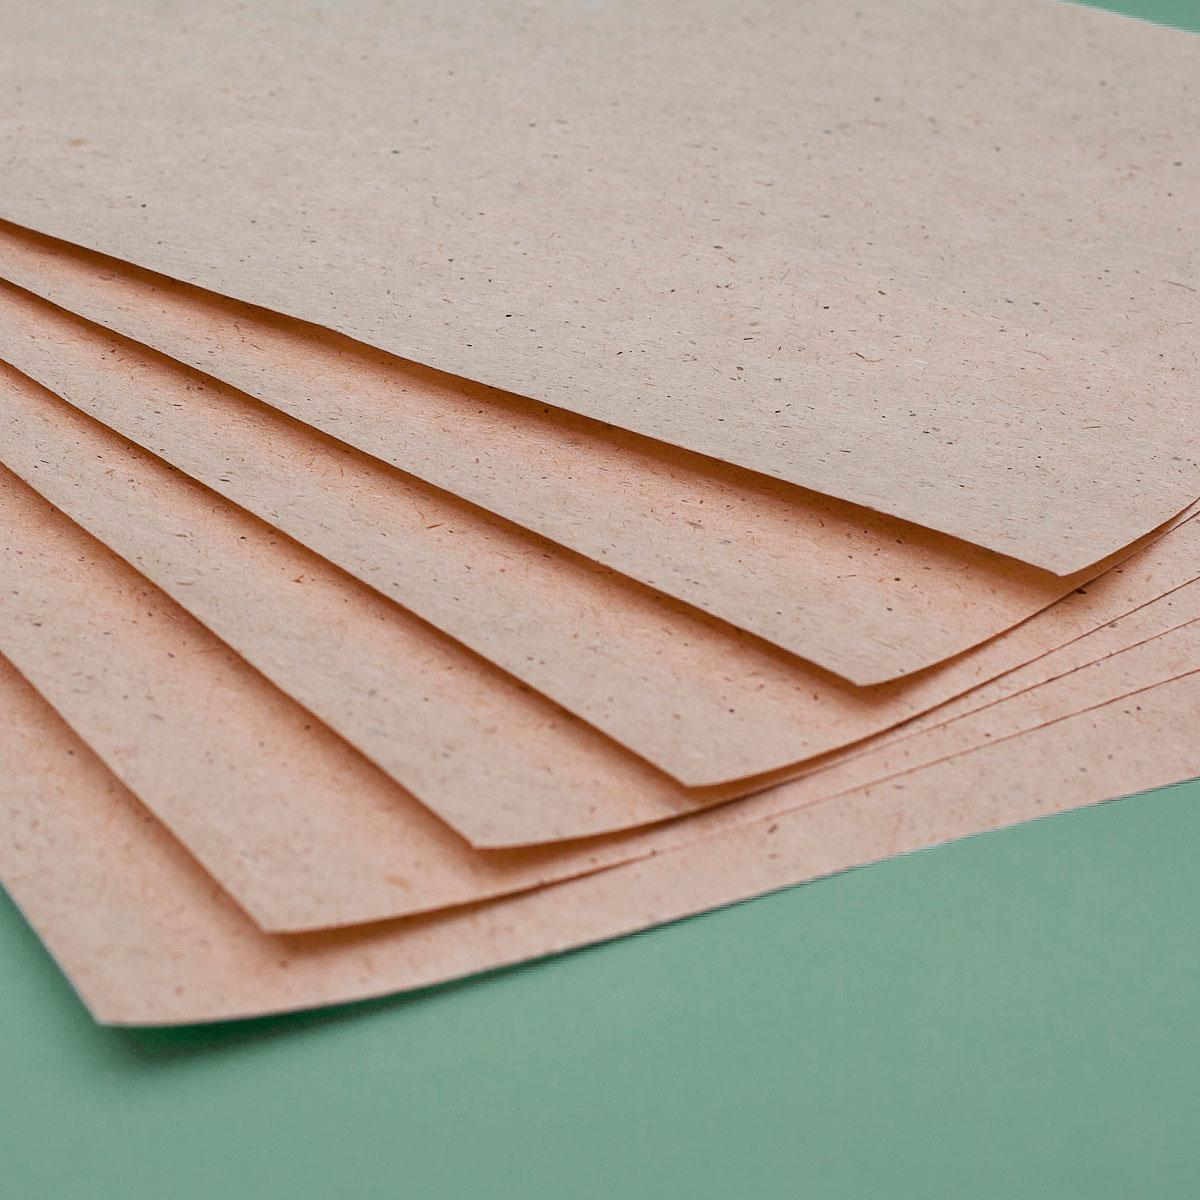 Бумага резаная обёрточная обойная. Бумага марки Е